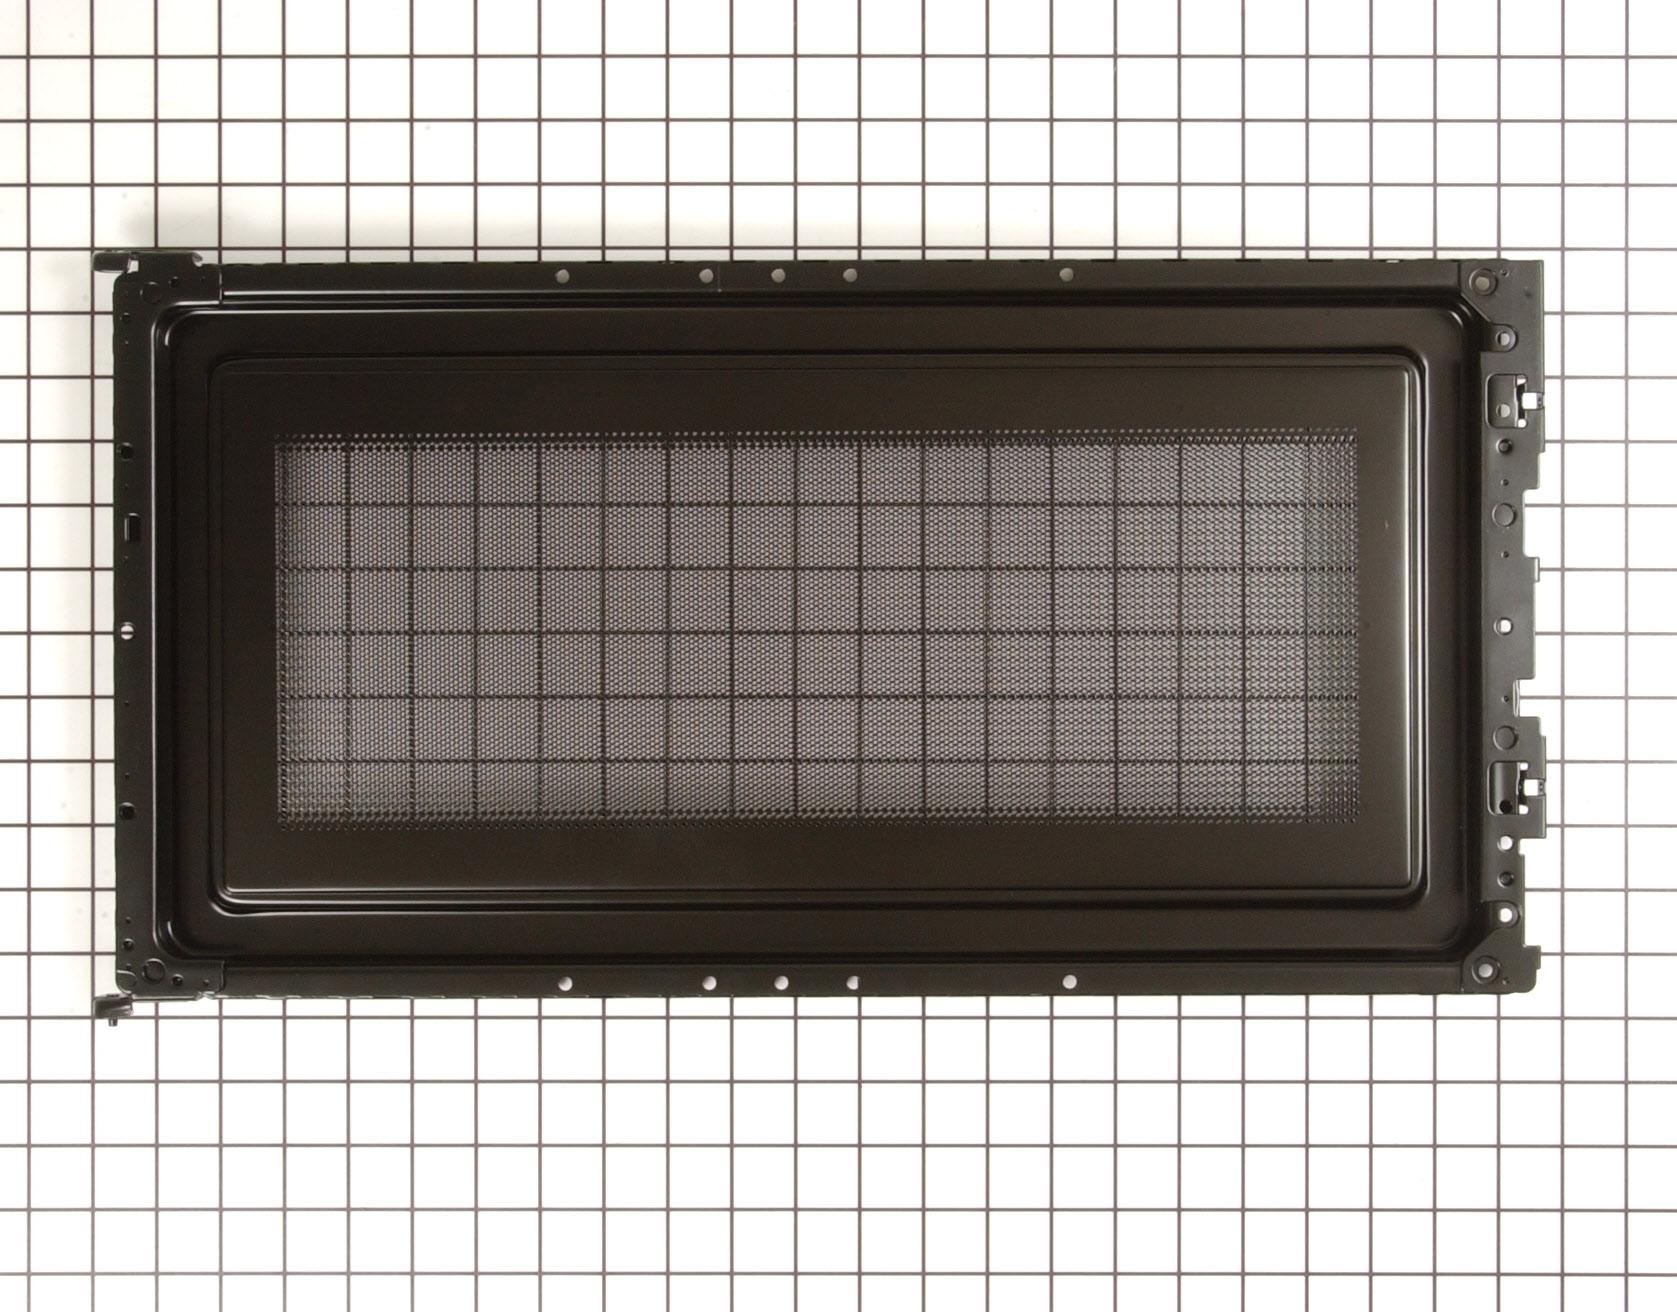 GE Microwave Part # WB55X10531 - Inner Door Panel